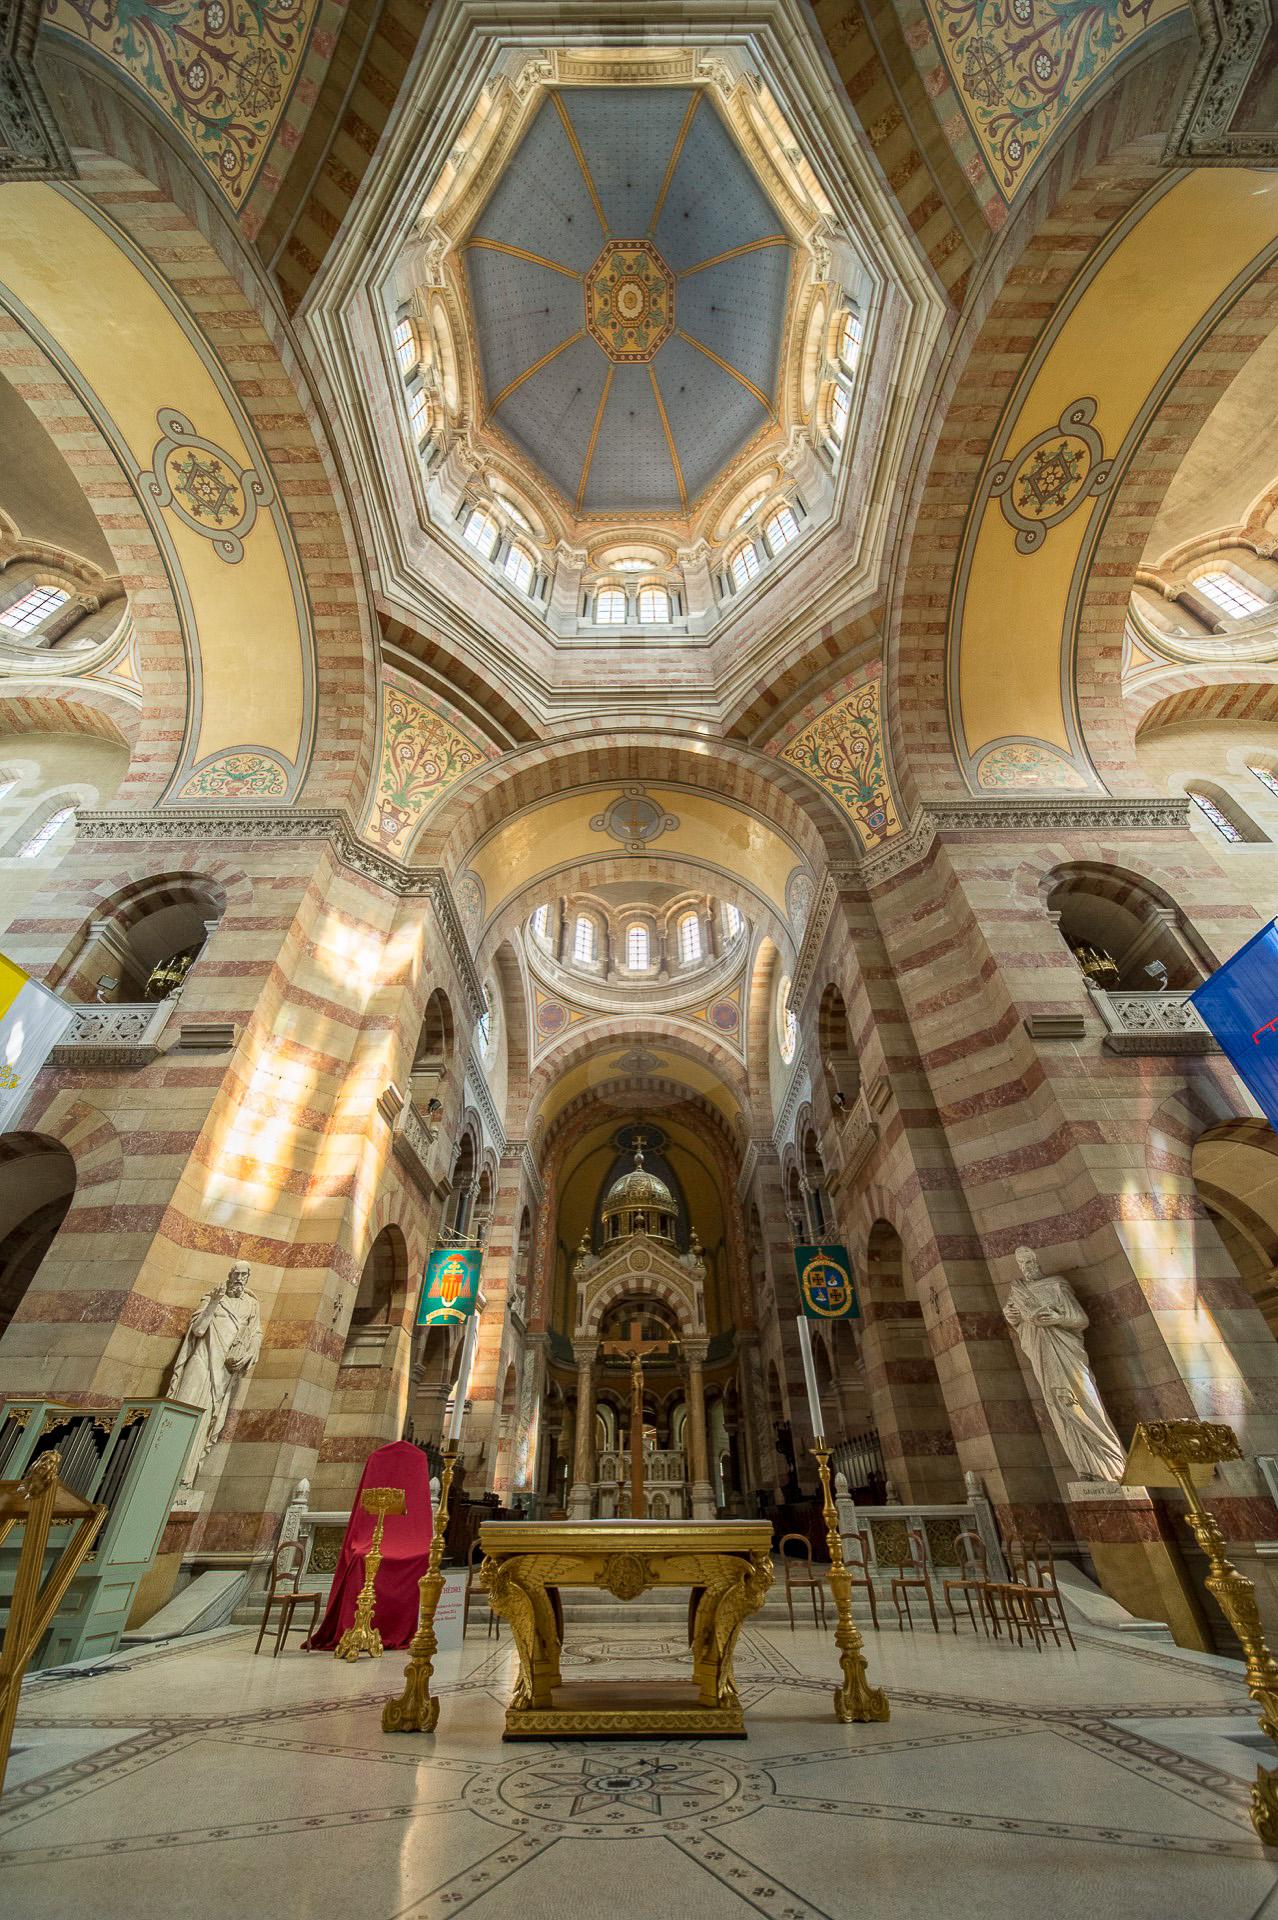 027-balade-vers-la-cathedrale-de-la-major-avril-2017-hdr-1920-px